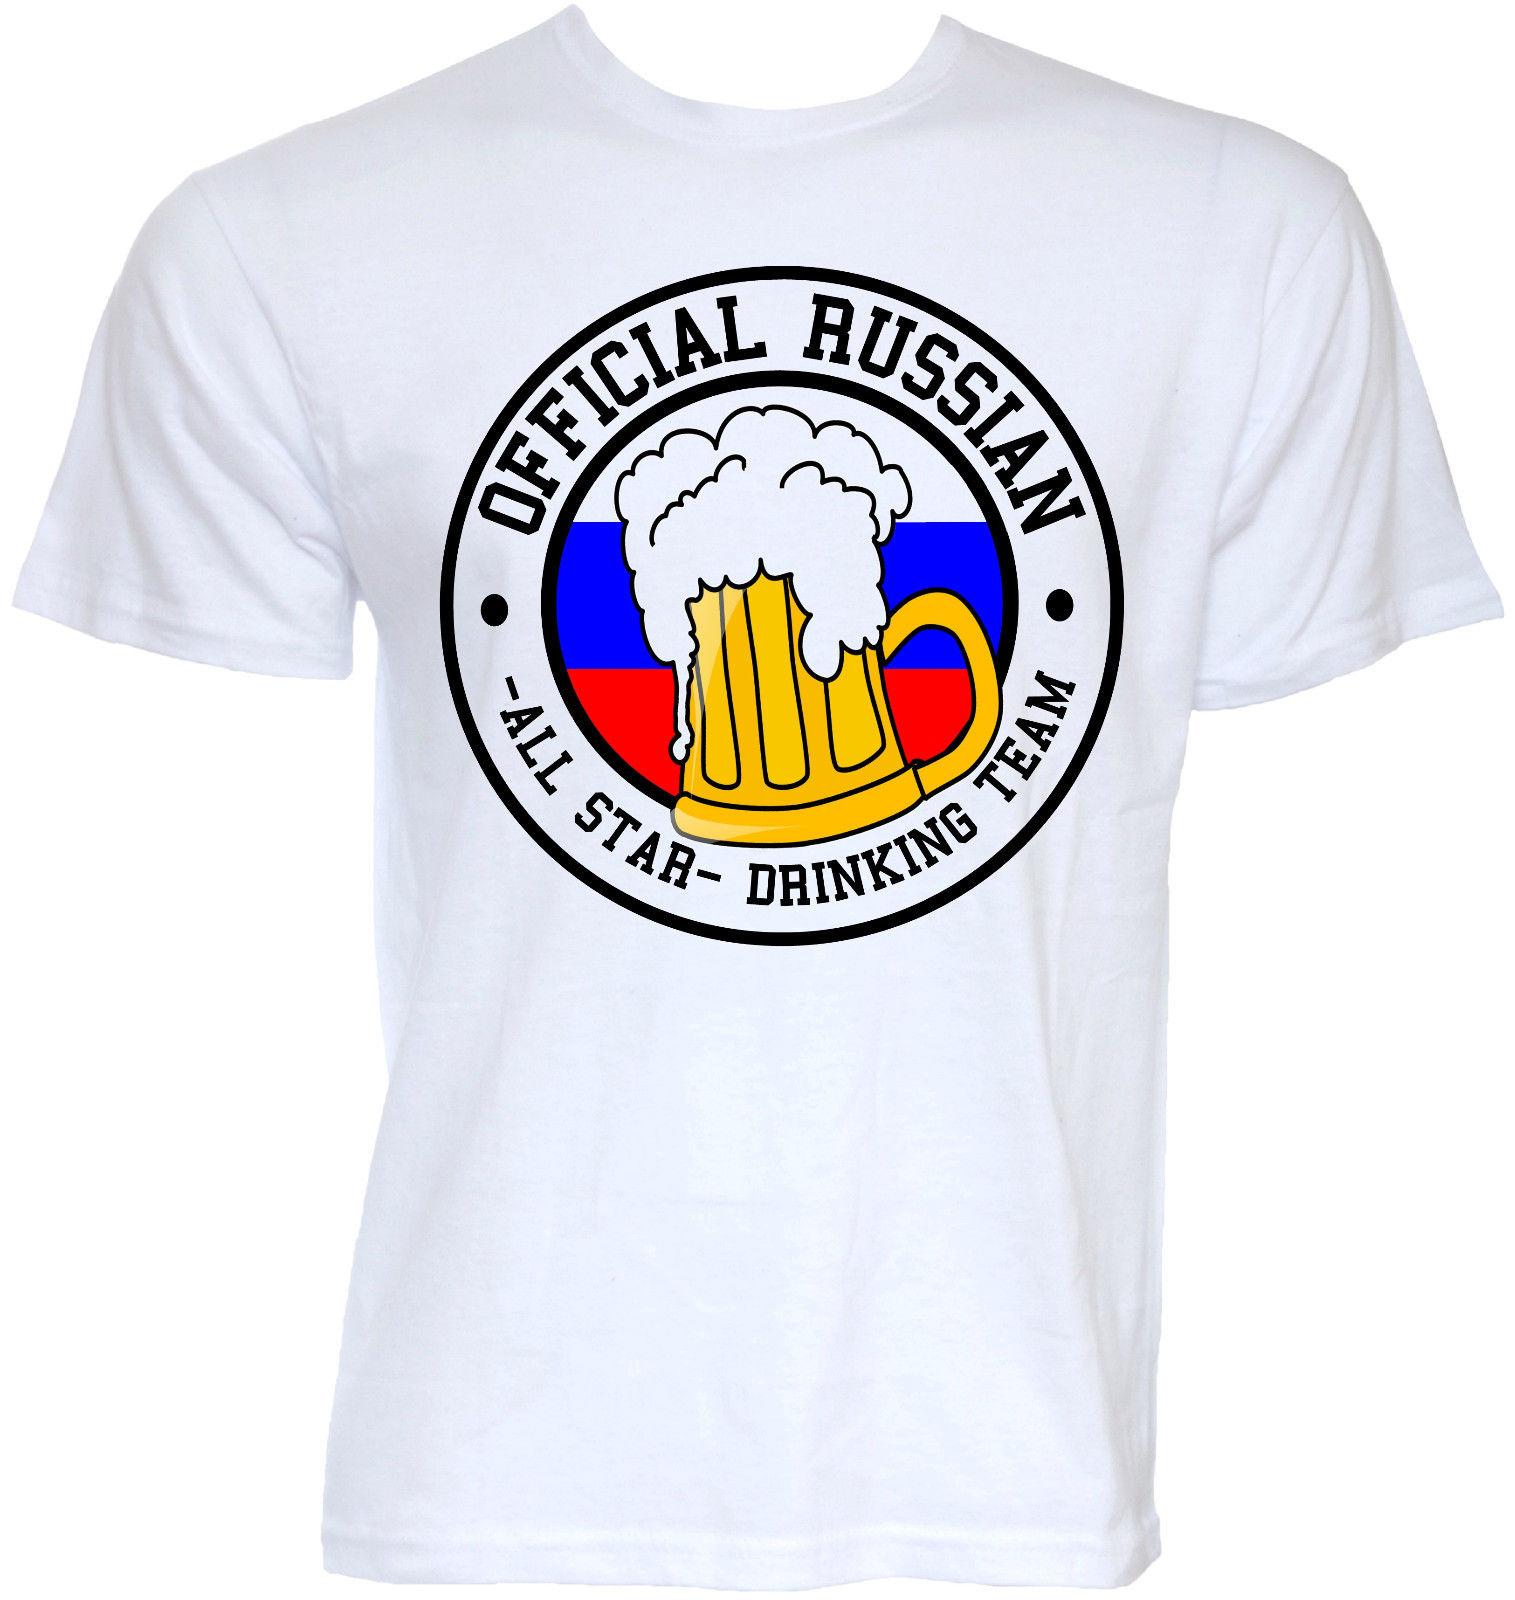 RUSSIAN T-SHIRTS MENS FUNNY COOL NOVELTY RUSSIA FLAG JOKE SLOGAN GIFTS T-SHIRT